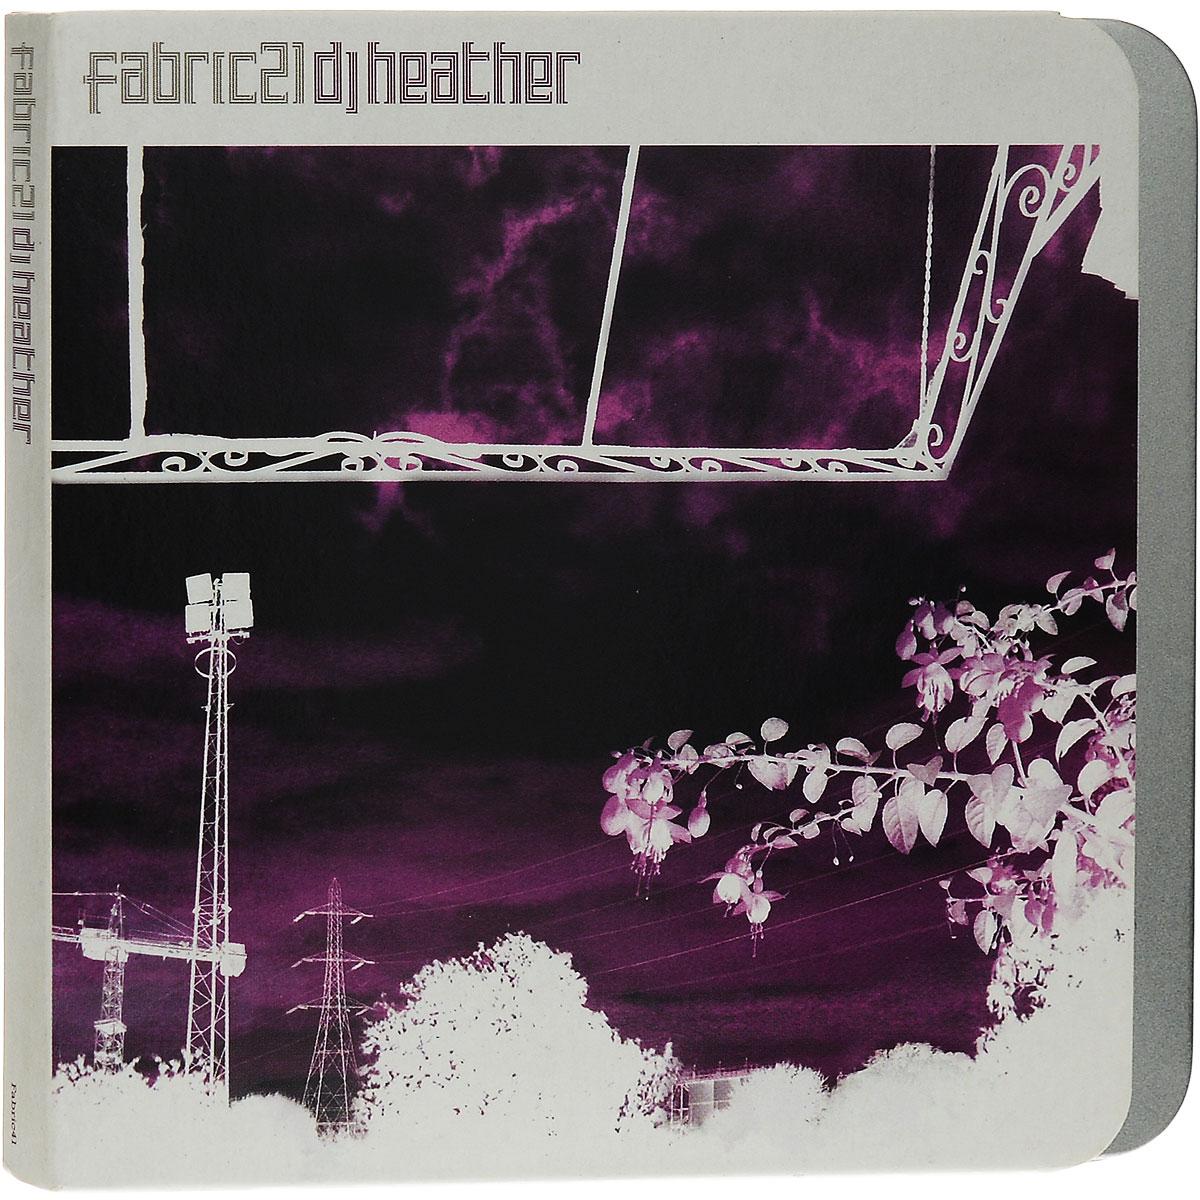 DJ Heather,Марко Милитано,D'jilz,Mr. Hall Lee,DJ Mes,2 Utes,Оливер Десмет DJ Heather. Fabric21